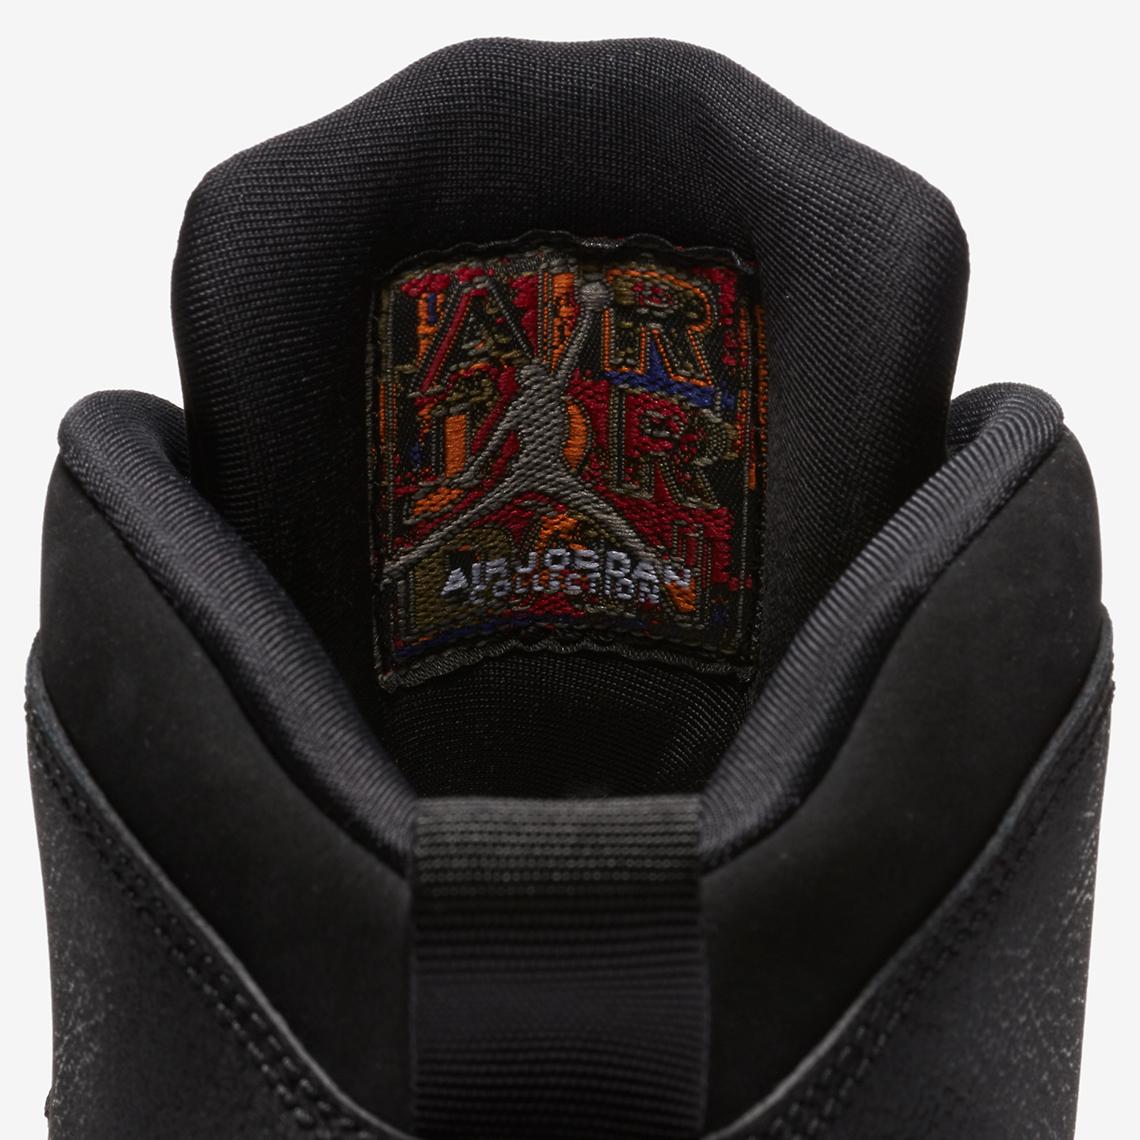 pretty nice 2e638 b1a15 Air Jordan 10. Release Date  February 10, 2018. Color  Black Fuchsia Blast Black  Style Code  487211-017. Advertisement. Advertisement. show comments